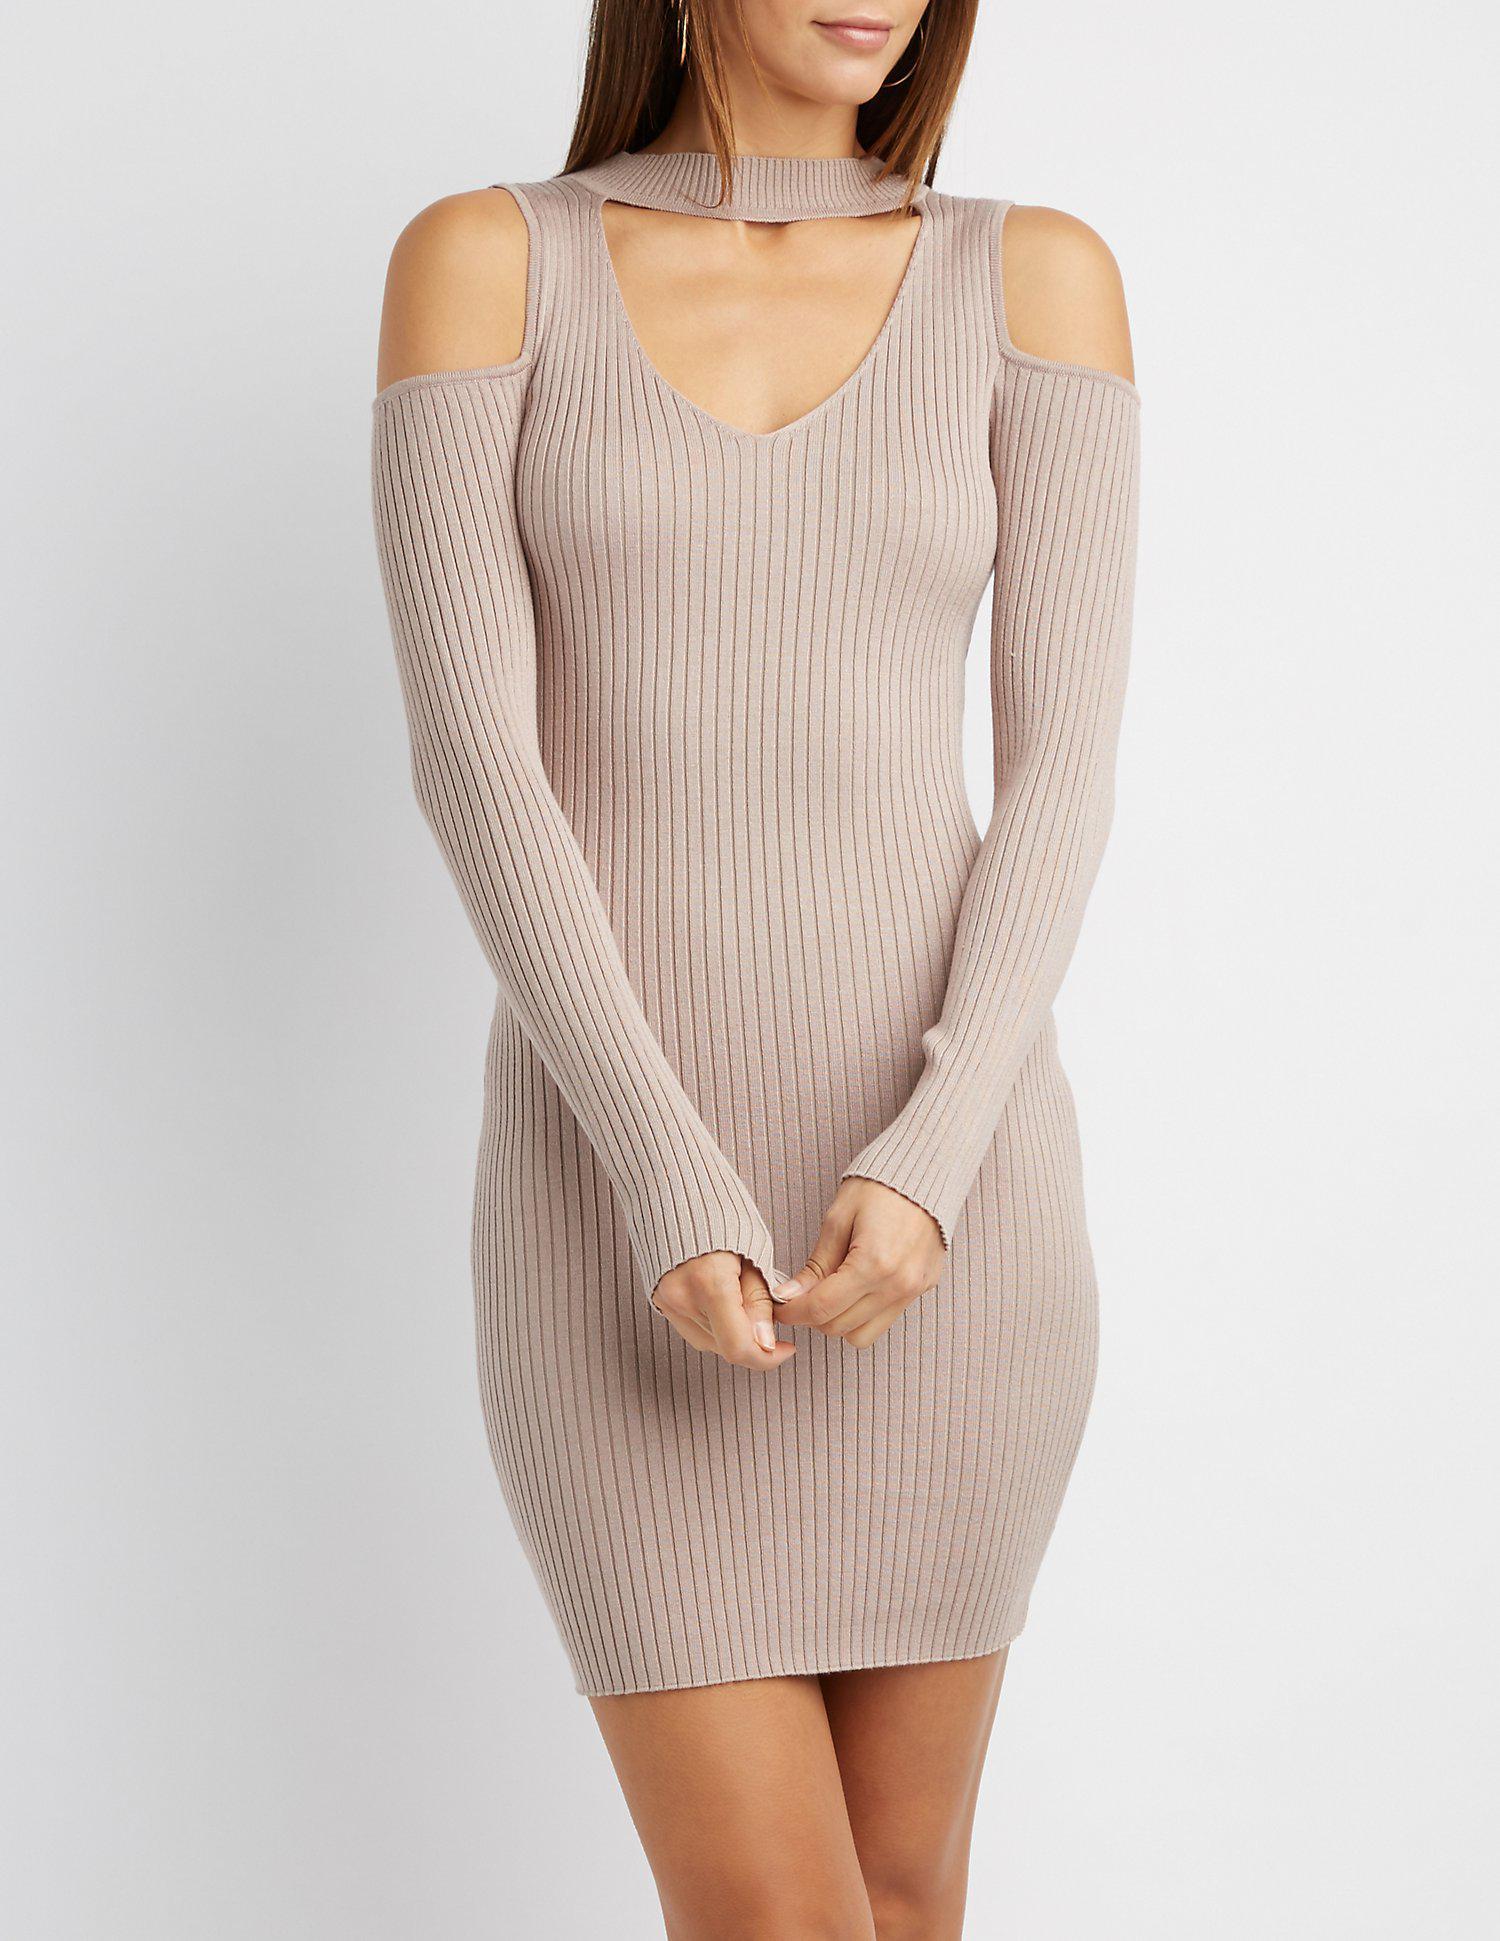 82e7b196d28 Lyst - Charlotte Russe Cold Shoulder Mock Neck Bodycon Sweater Dress